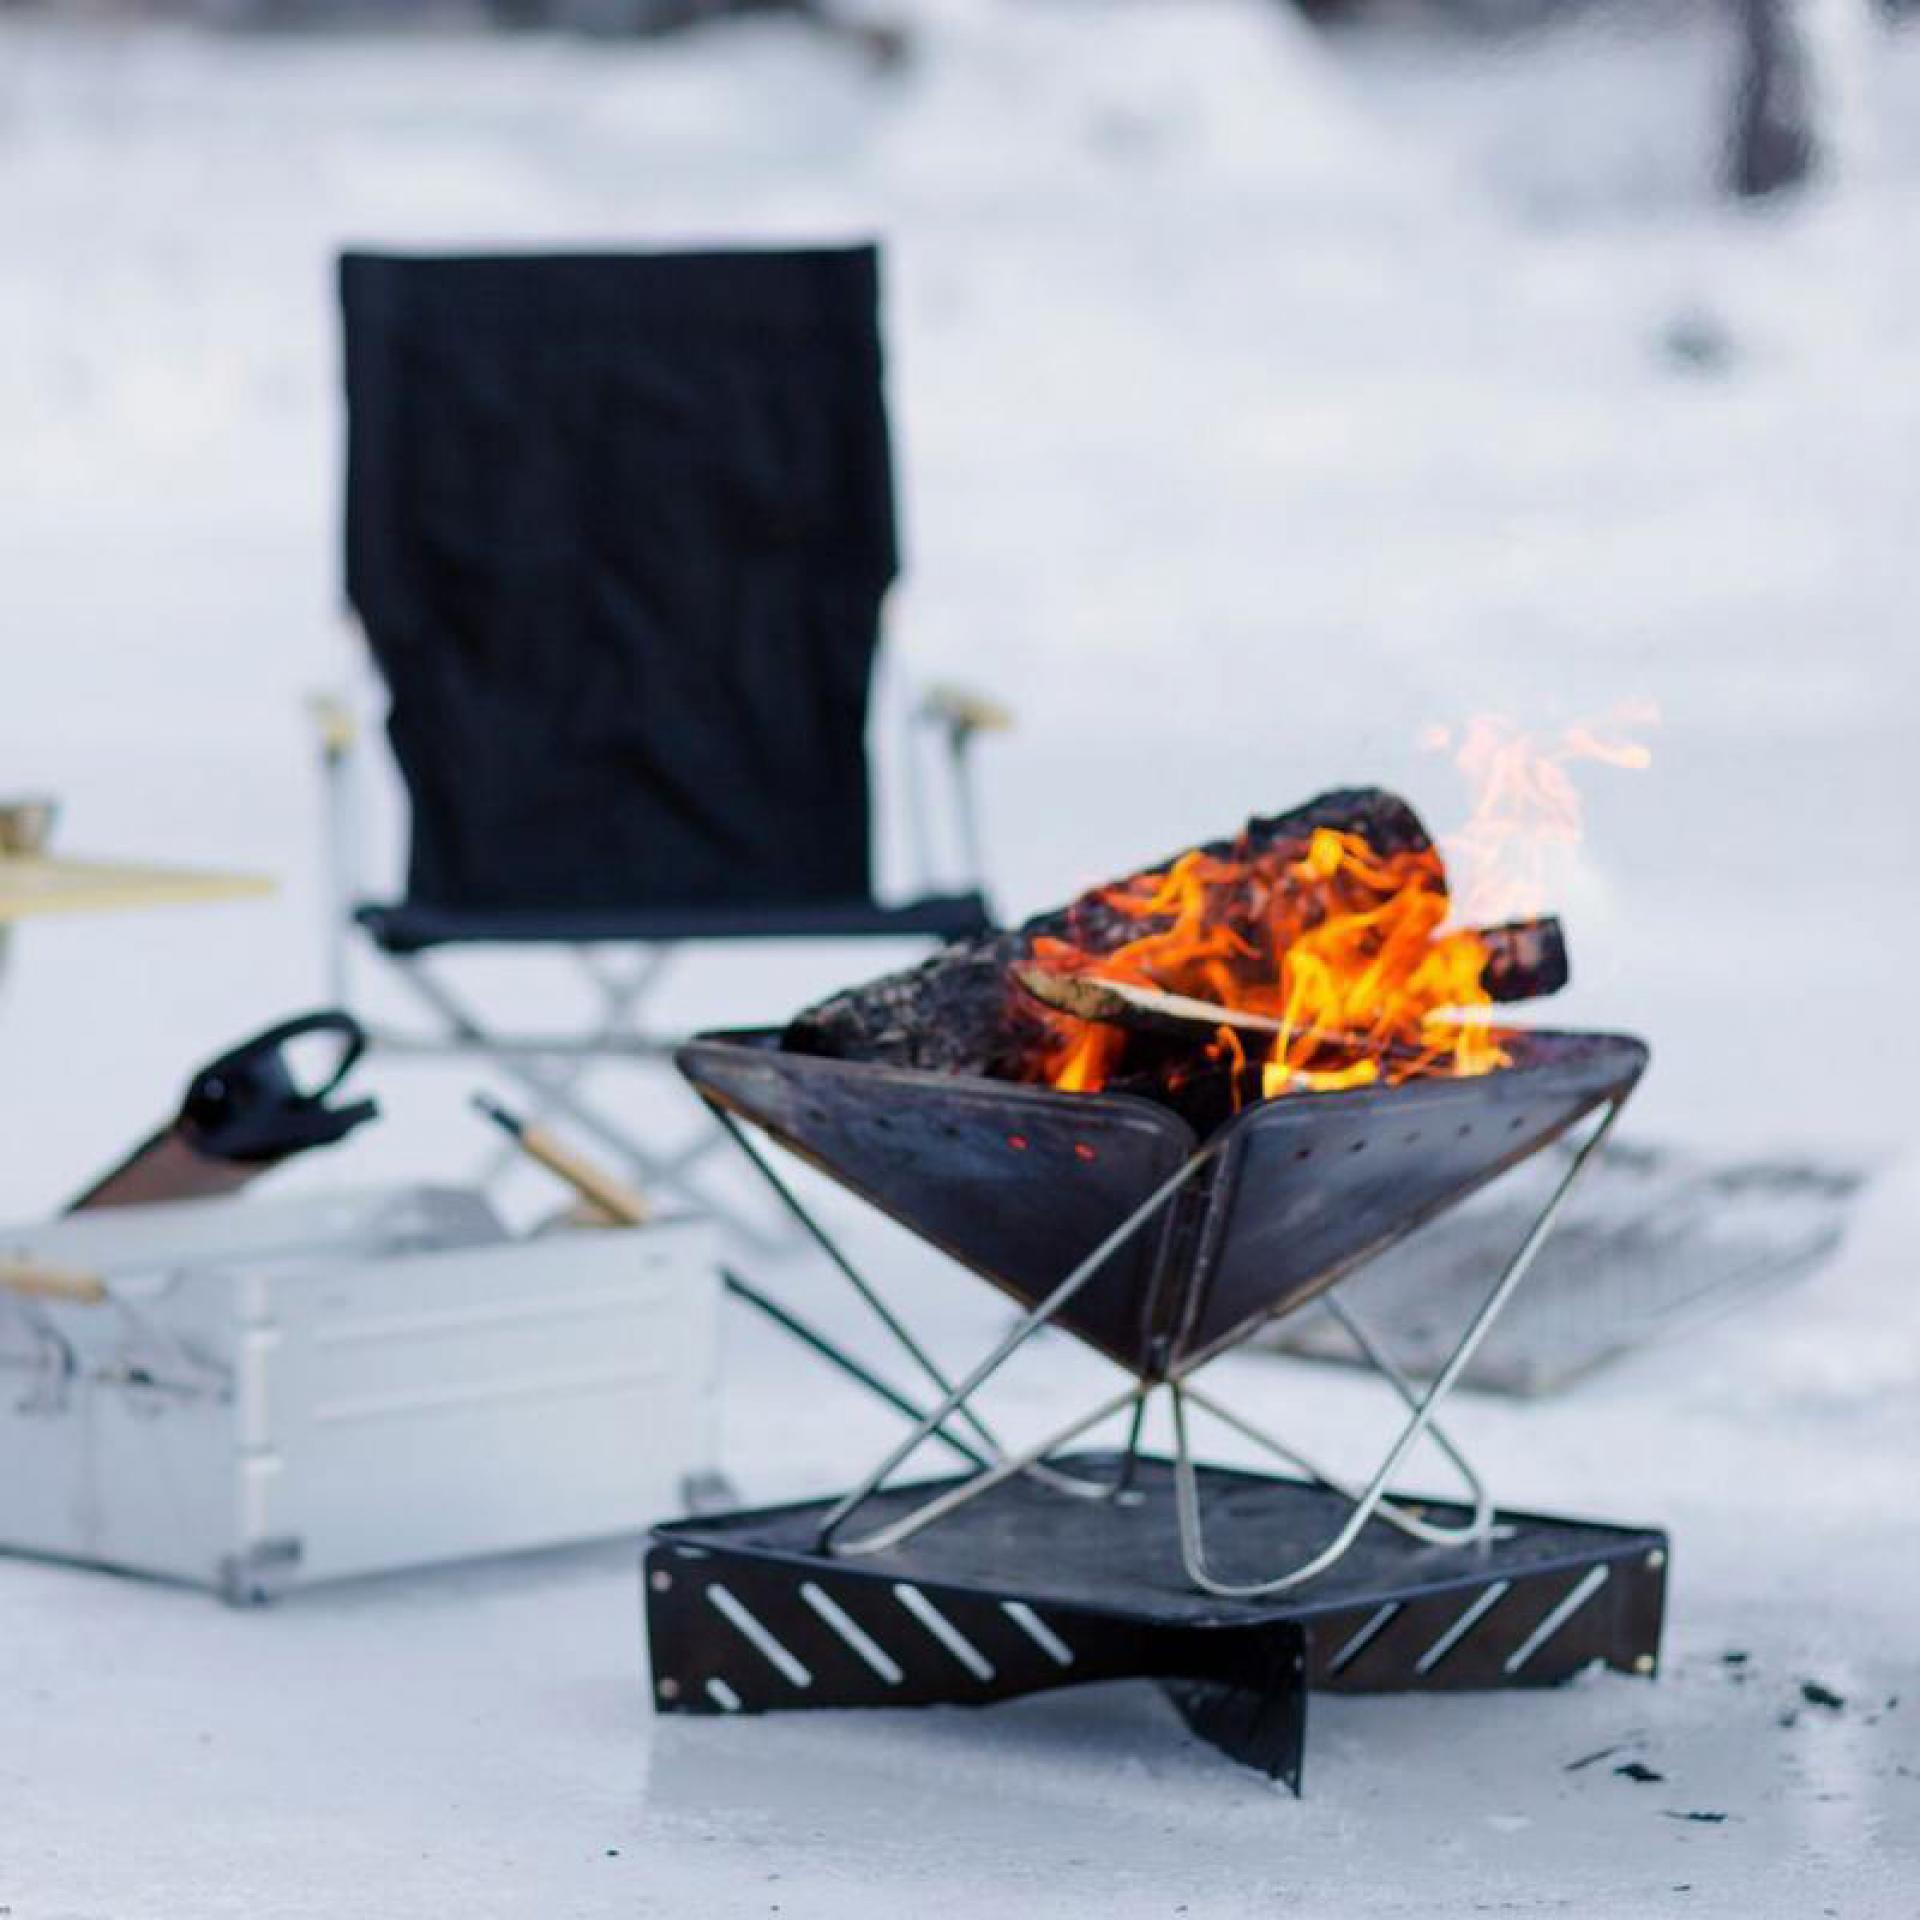 Snow Peak fireplace